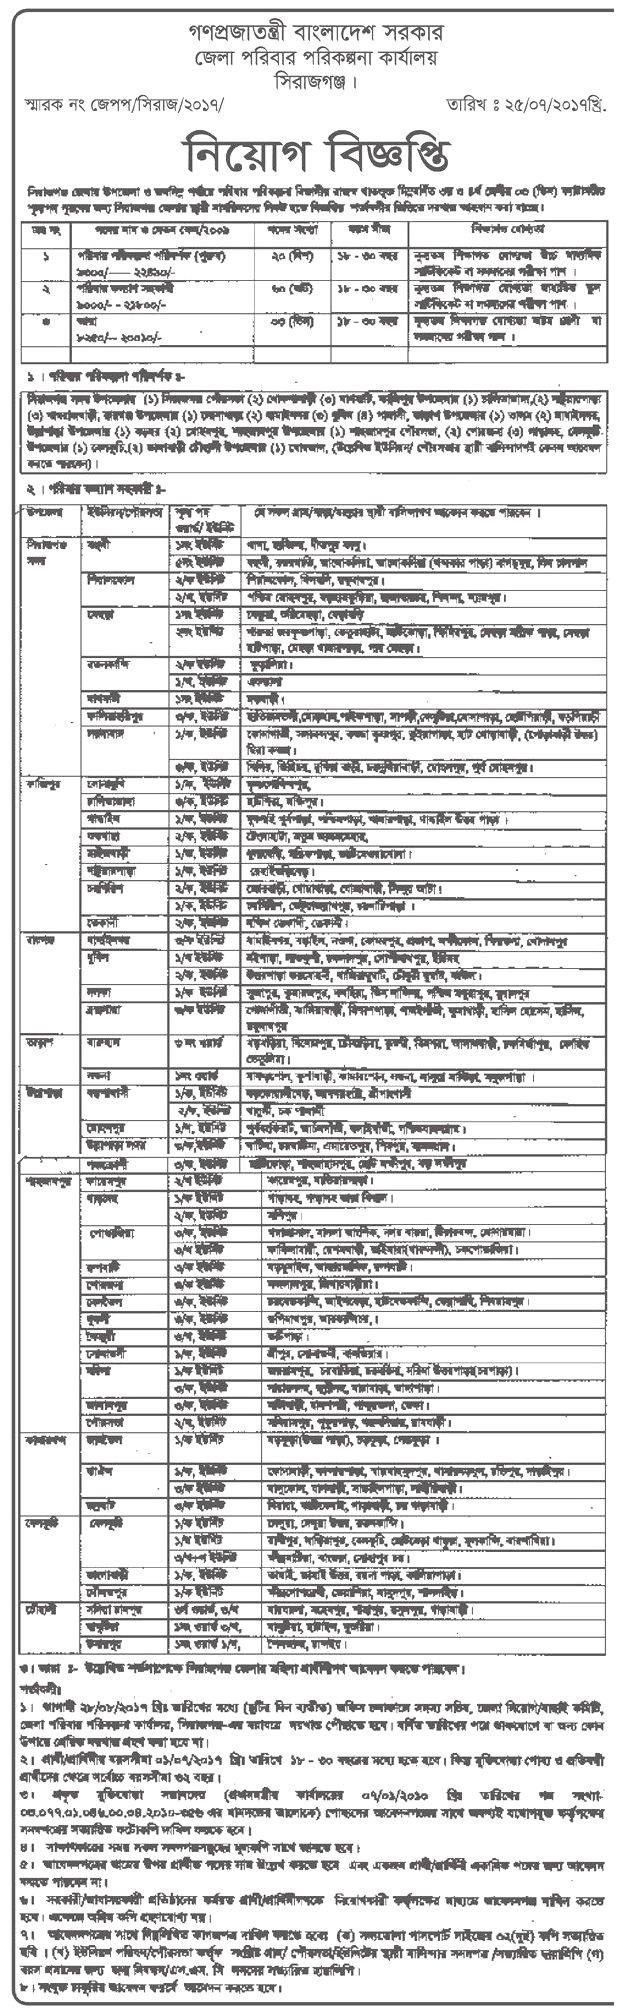 Sirajganj District Family Planning Office Job Circular 2017-1